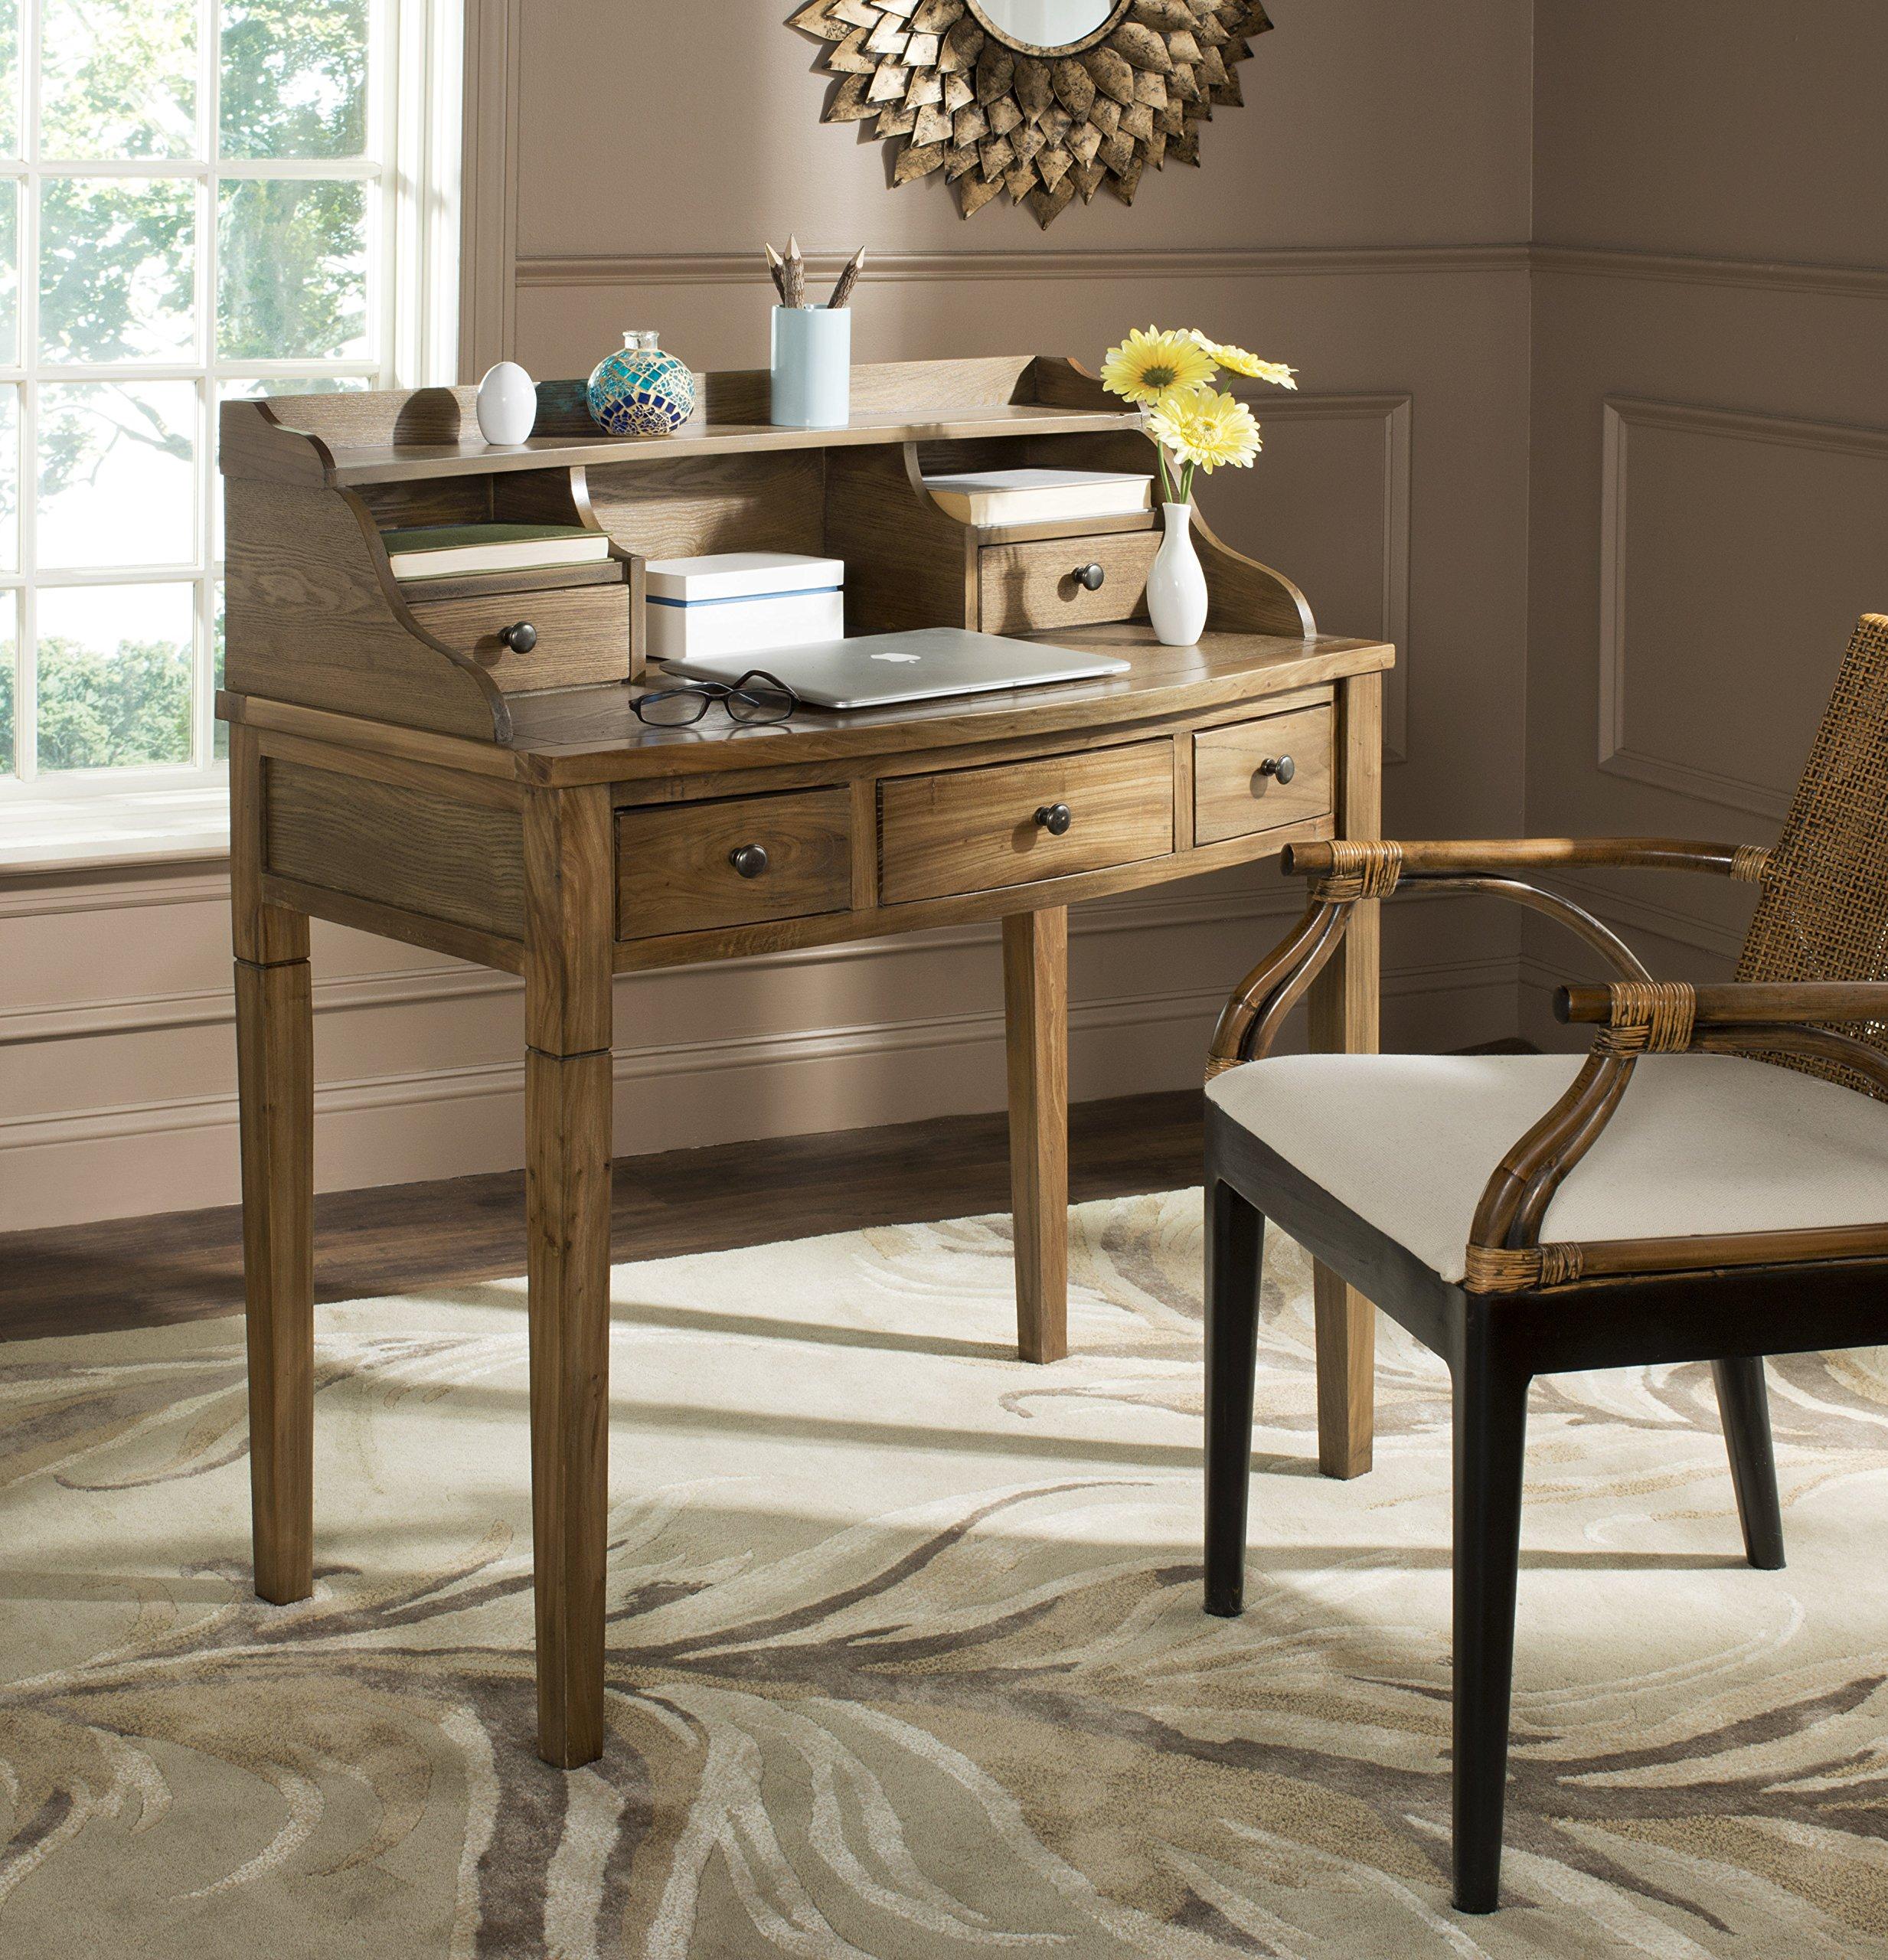 Safavieh American Homes Collection Landon Medium Oak Writing Desk by Safavieh